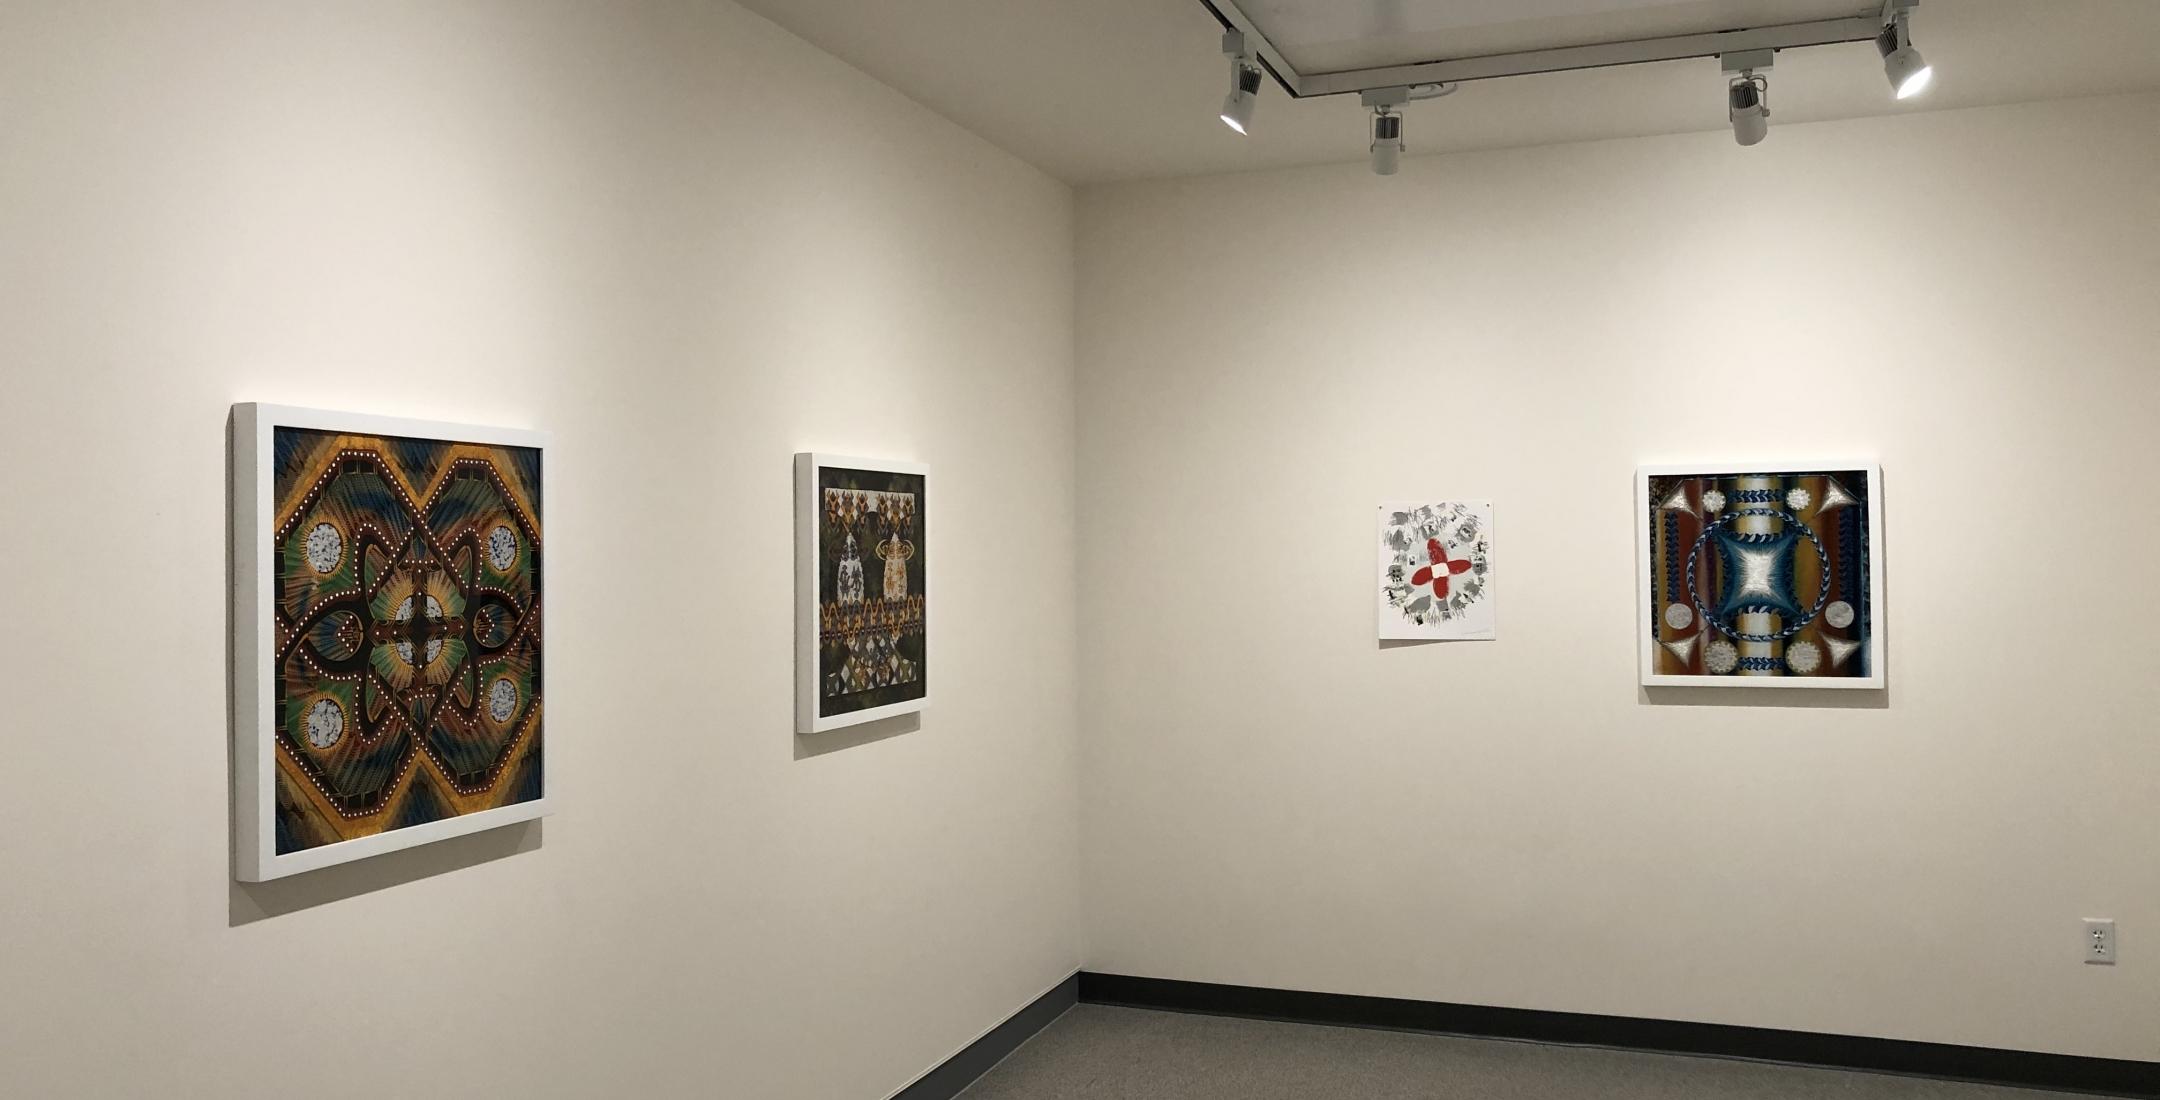 A Warm Reset - installation view (Tara Austin, James Brinsfield)